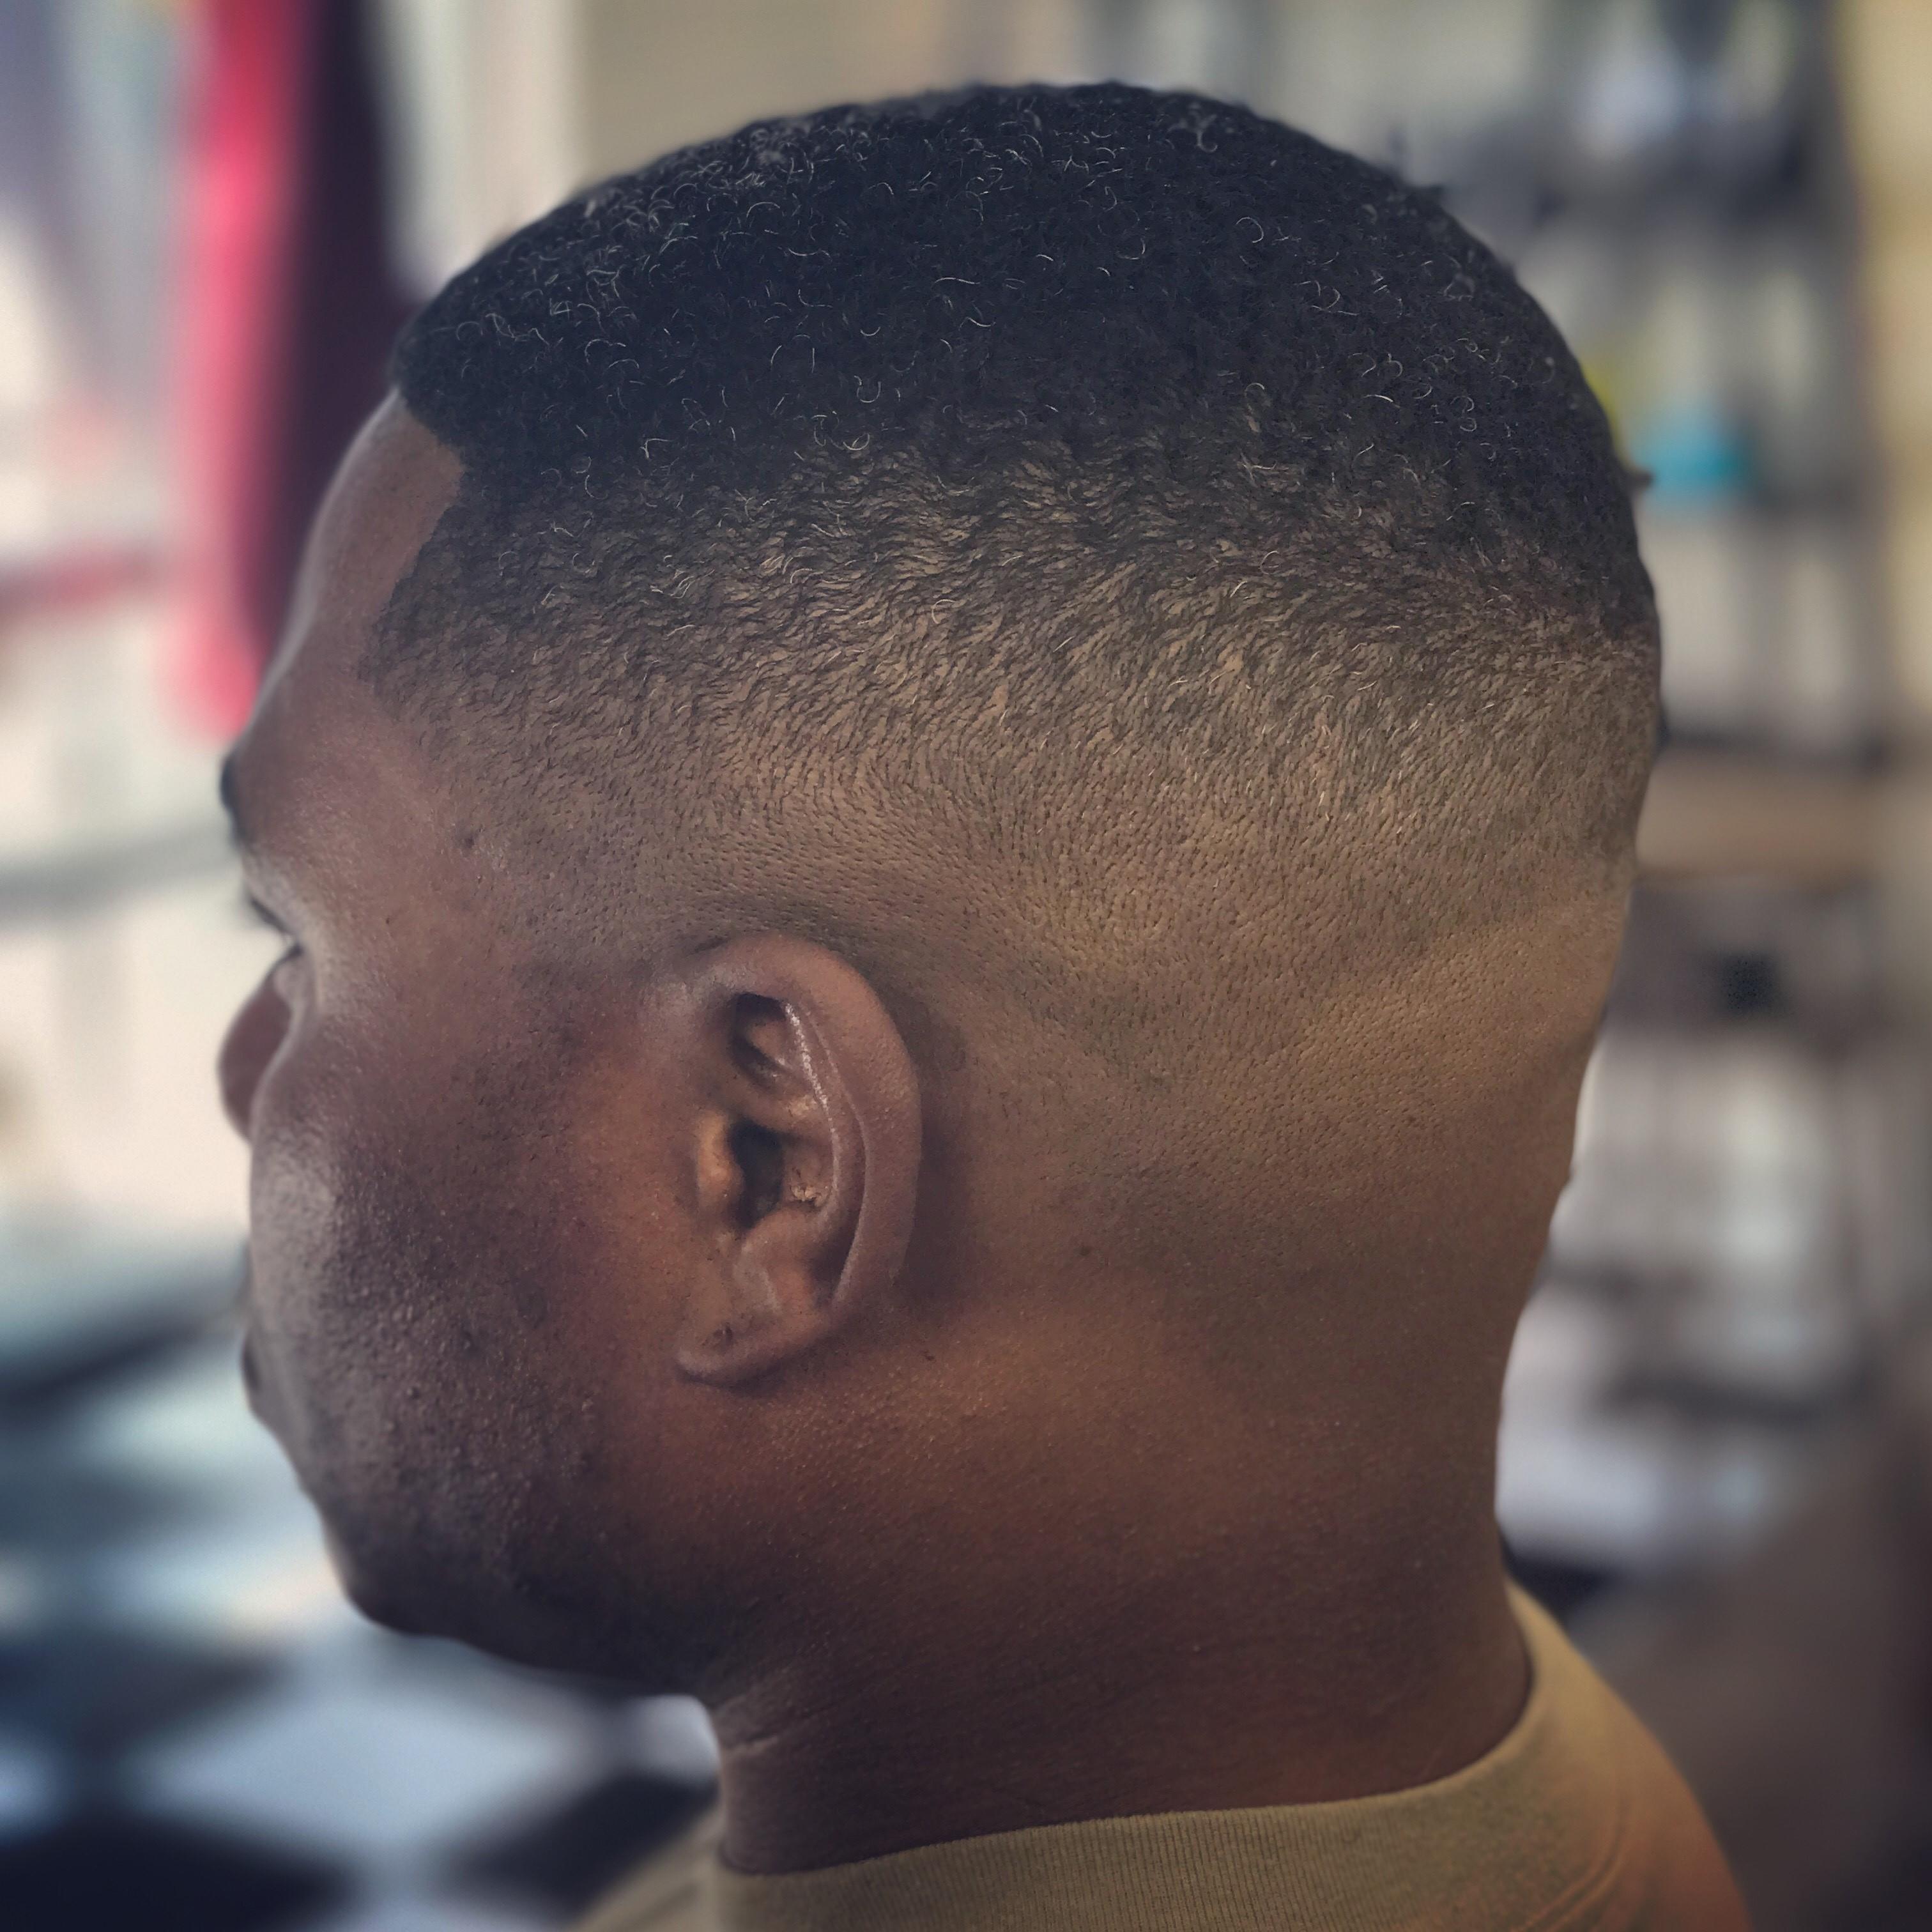 Shave And Haircut: El Paso, TX: La Barberia: Men's Hair Cuts, Color, Shaving